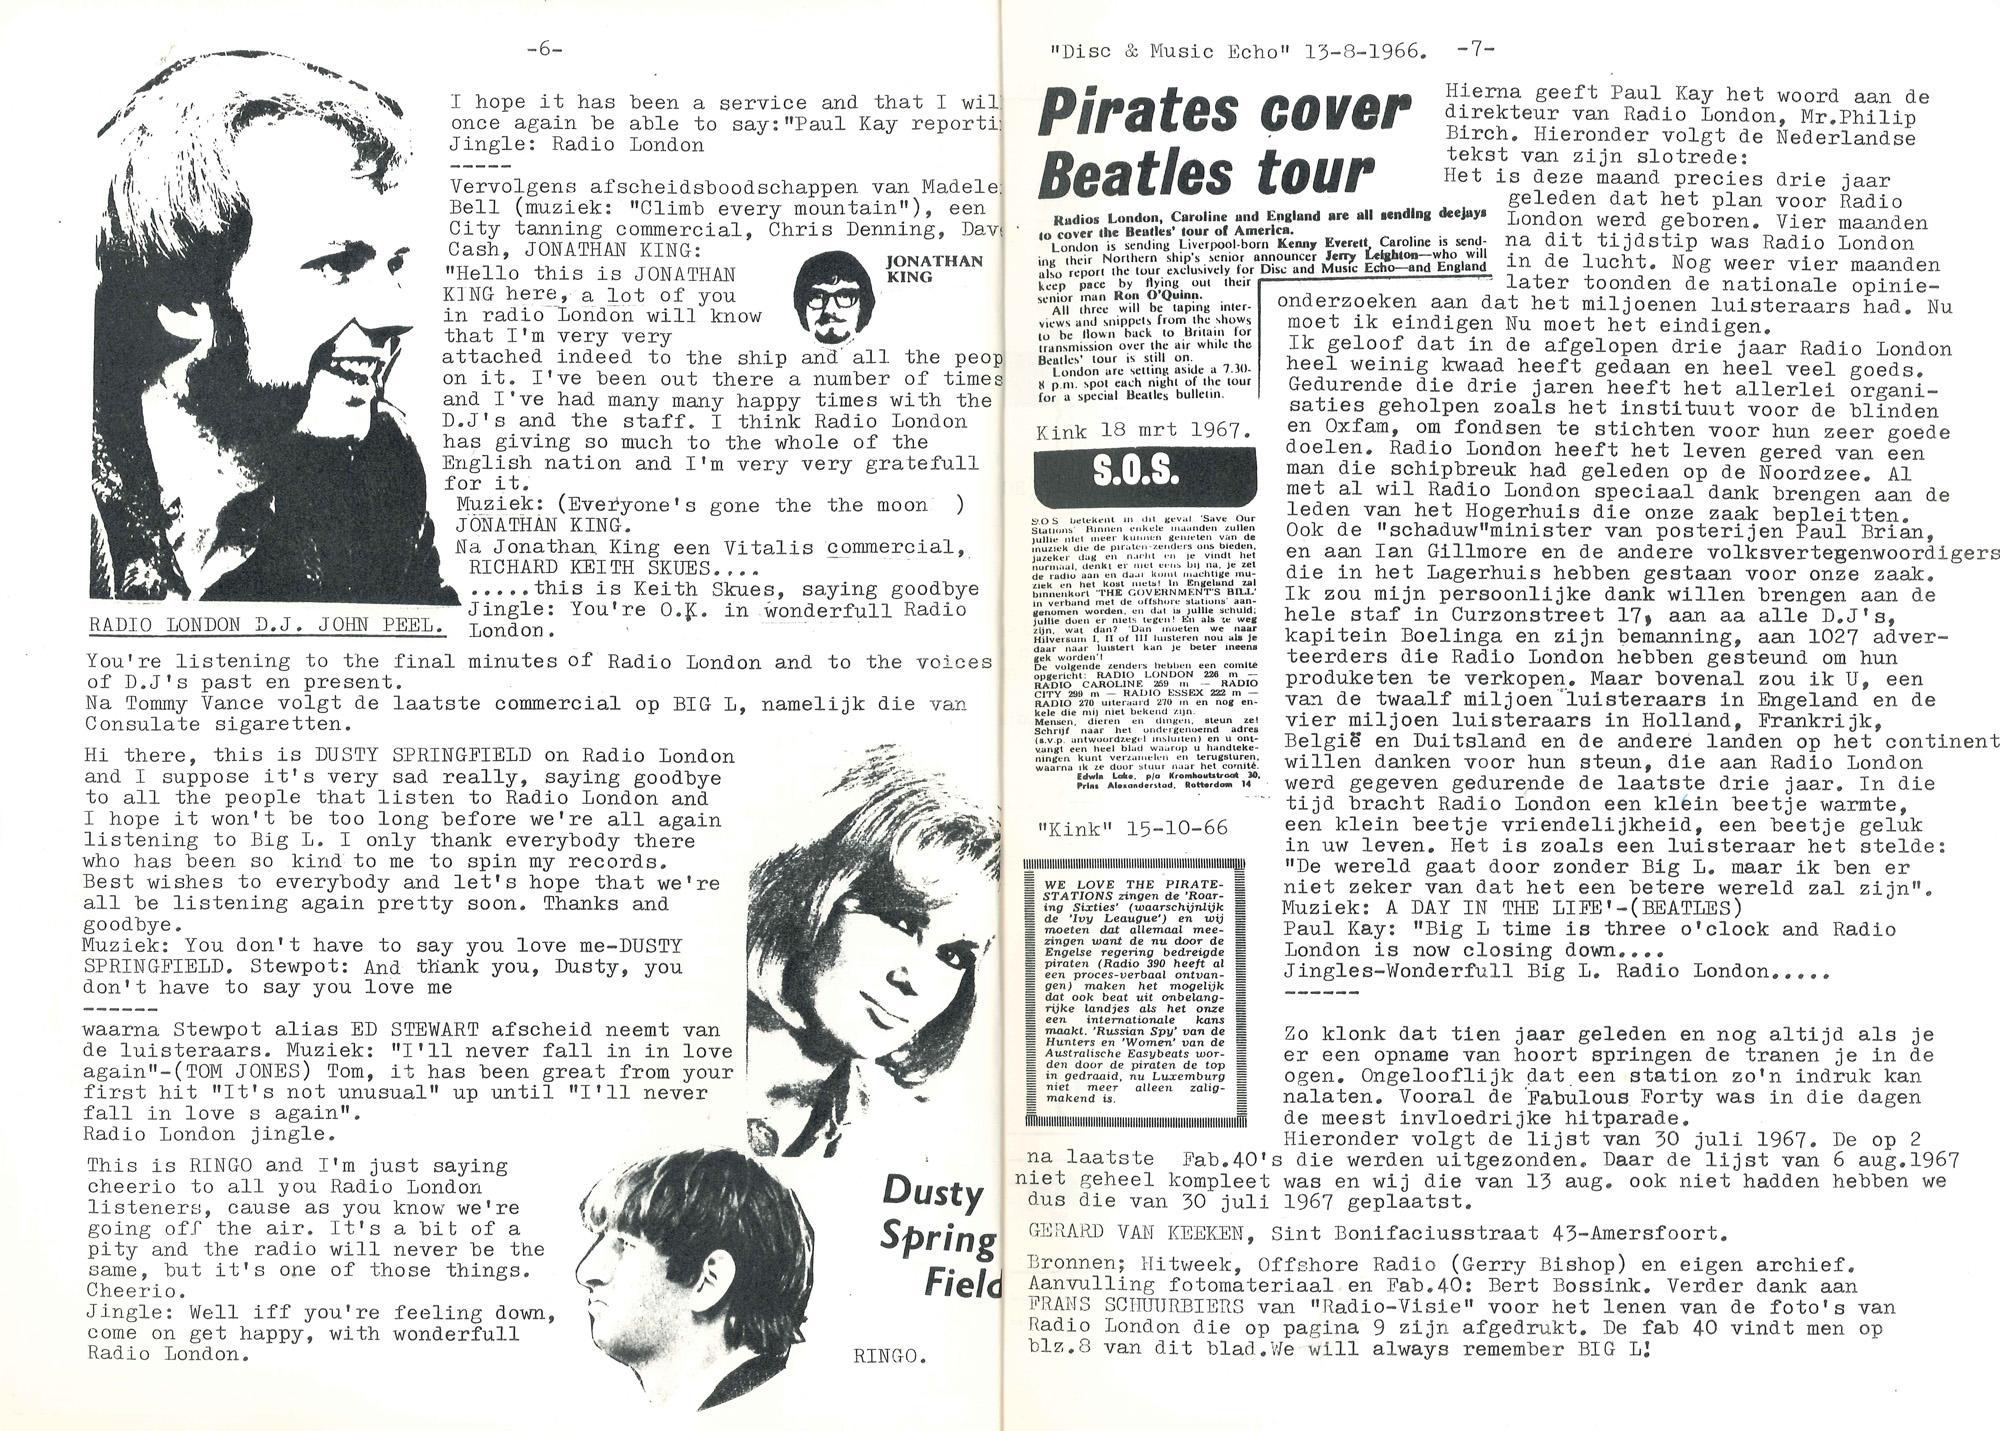 197708_TFSOTS_Radio_London03.jpg